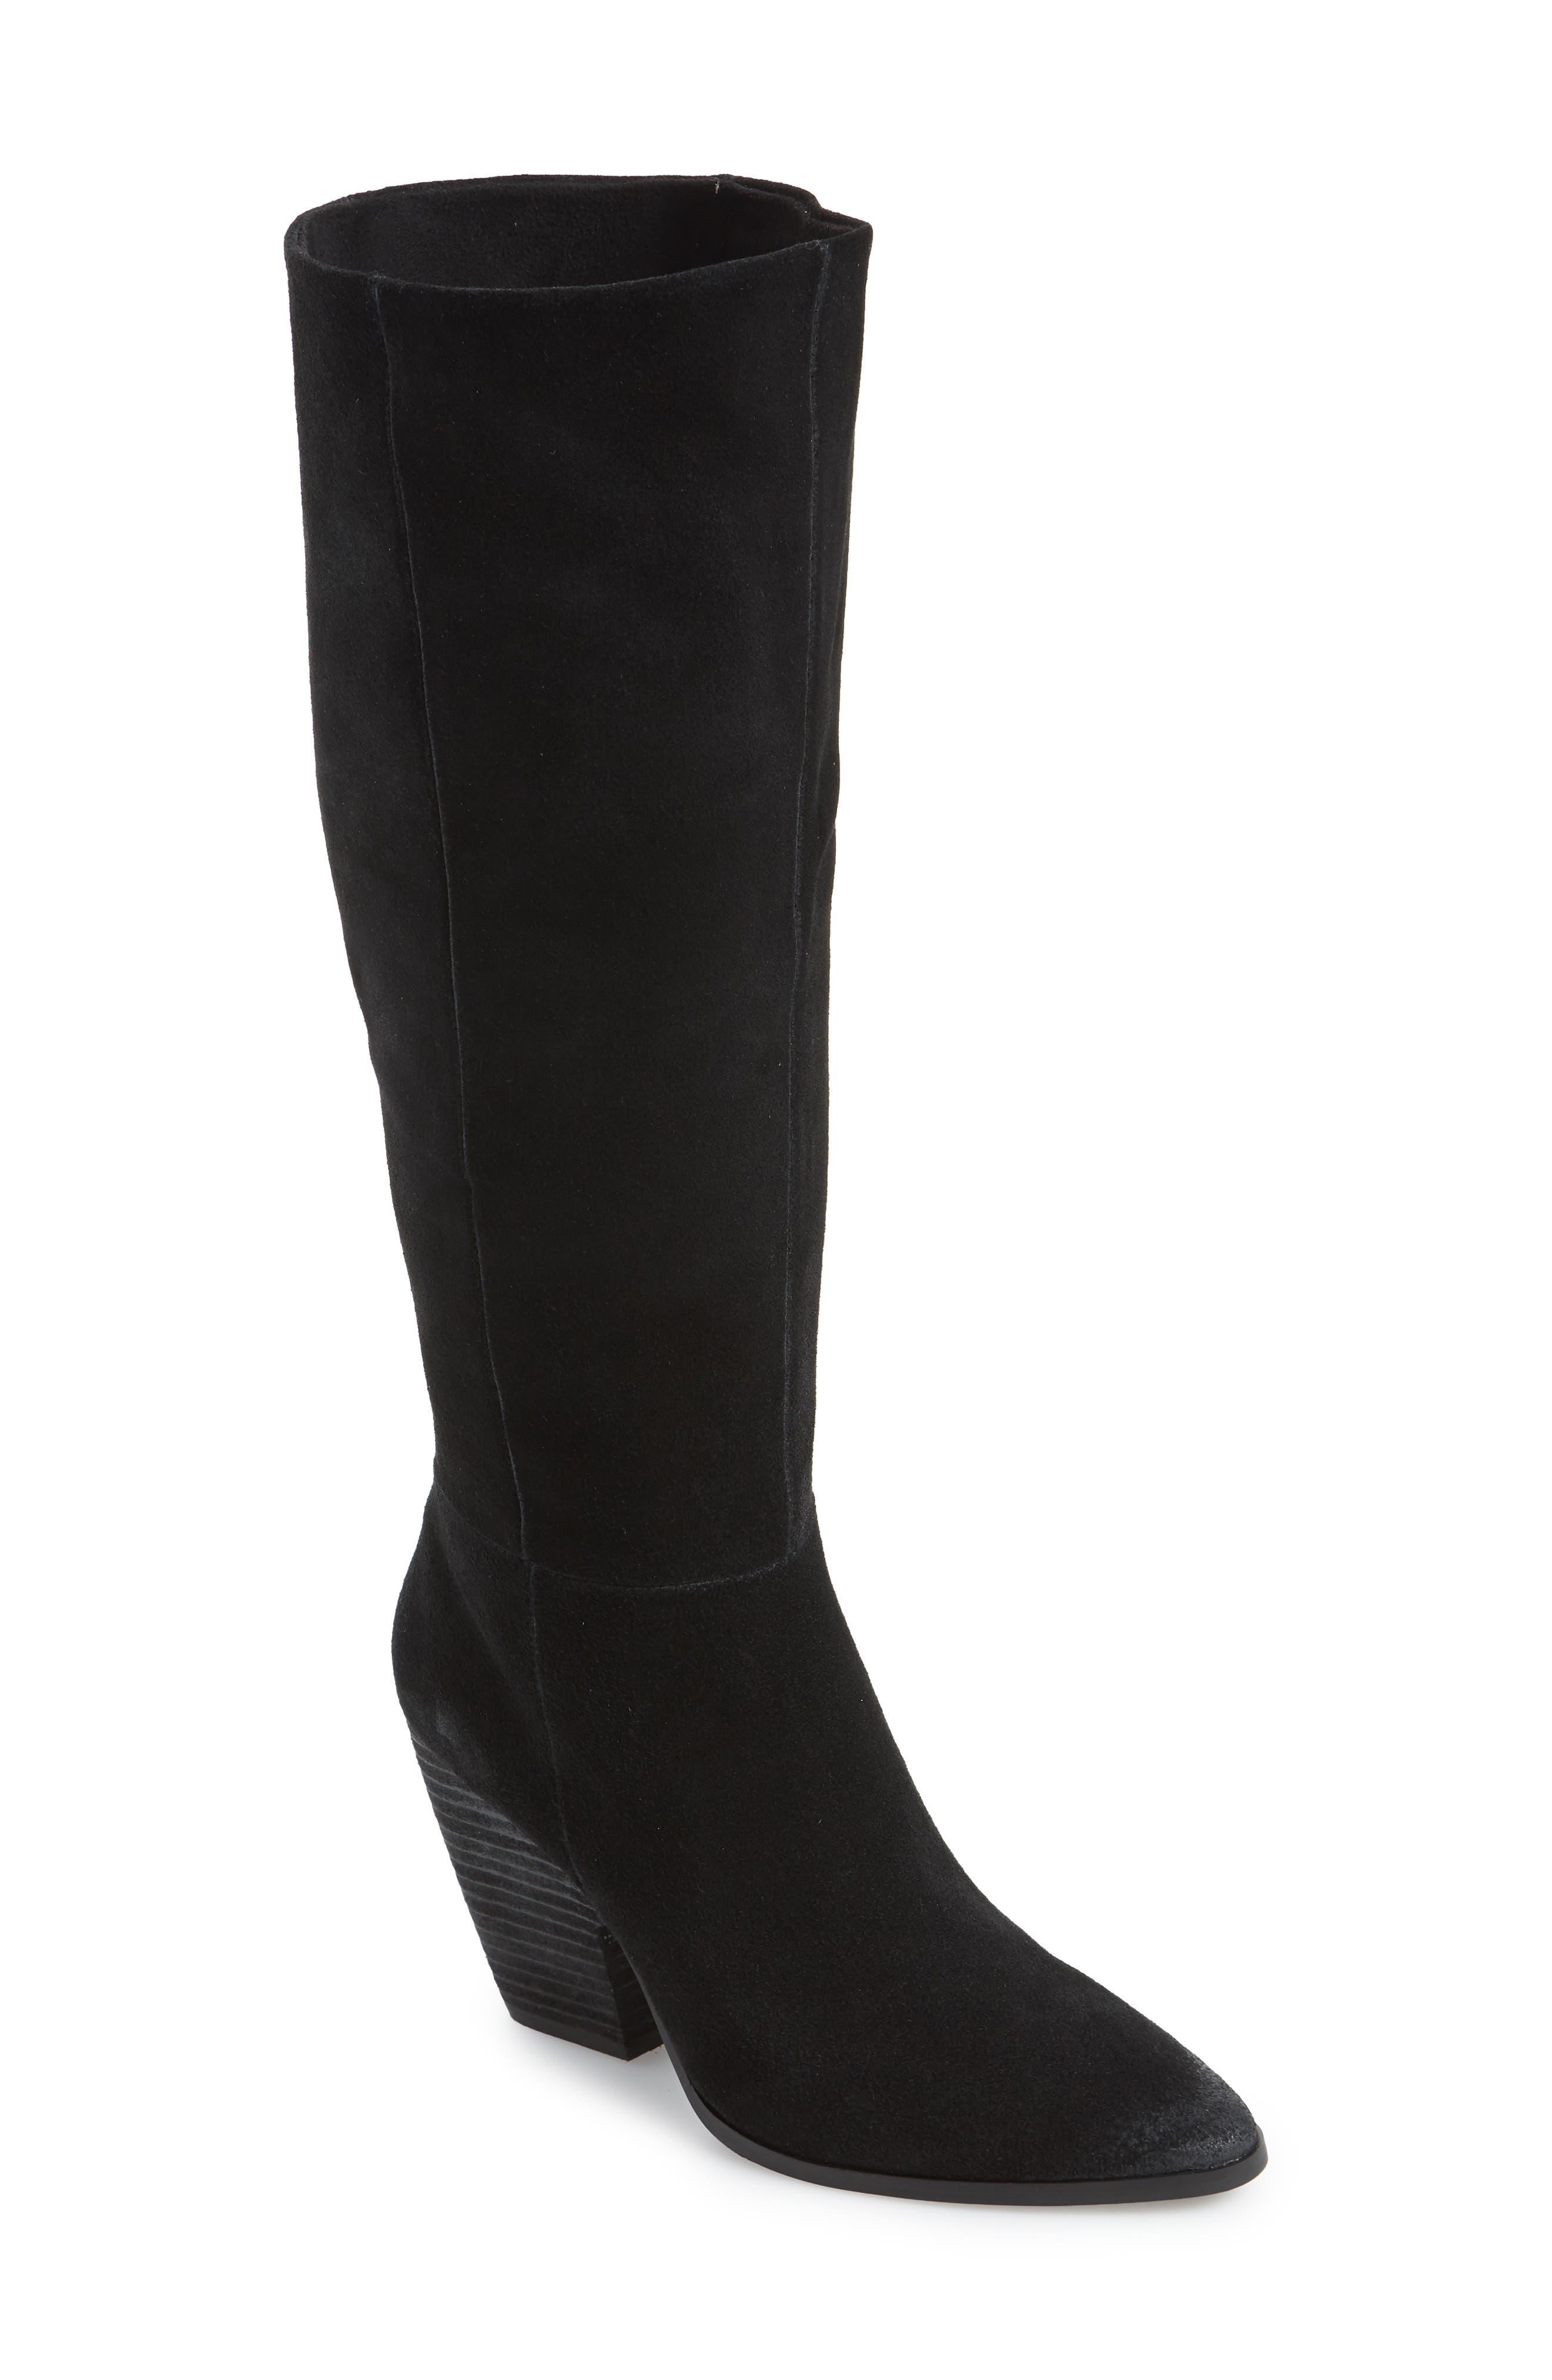 Charles By Charles David Nyles Knee High Boot, Black